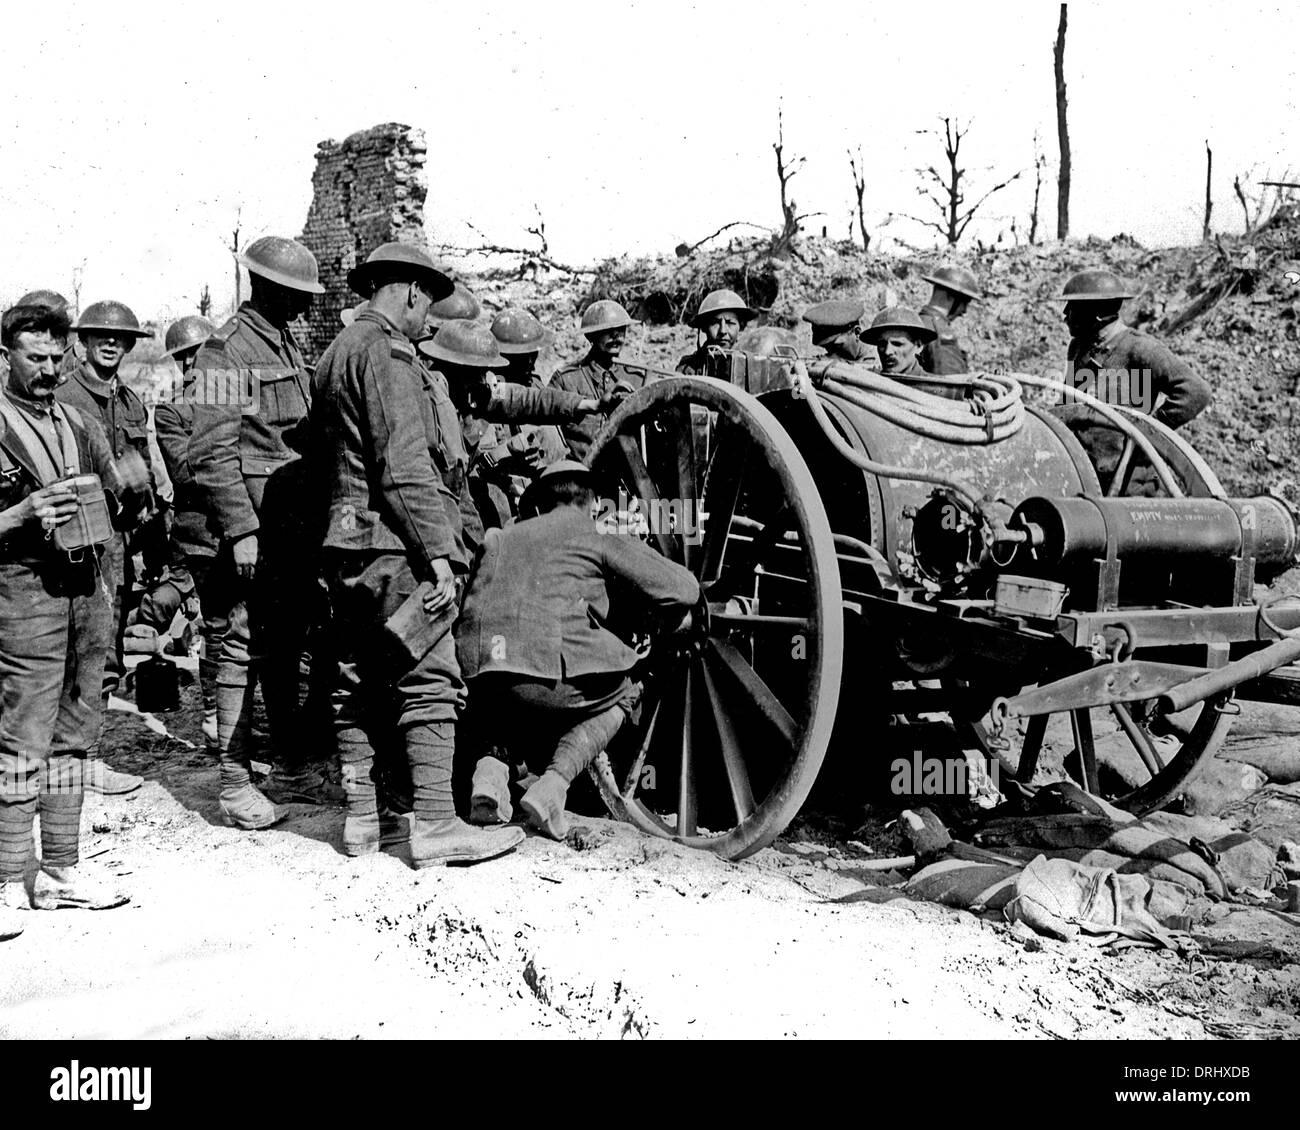 British soldiers standing round water cart, WW1 - Stock Image